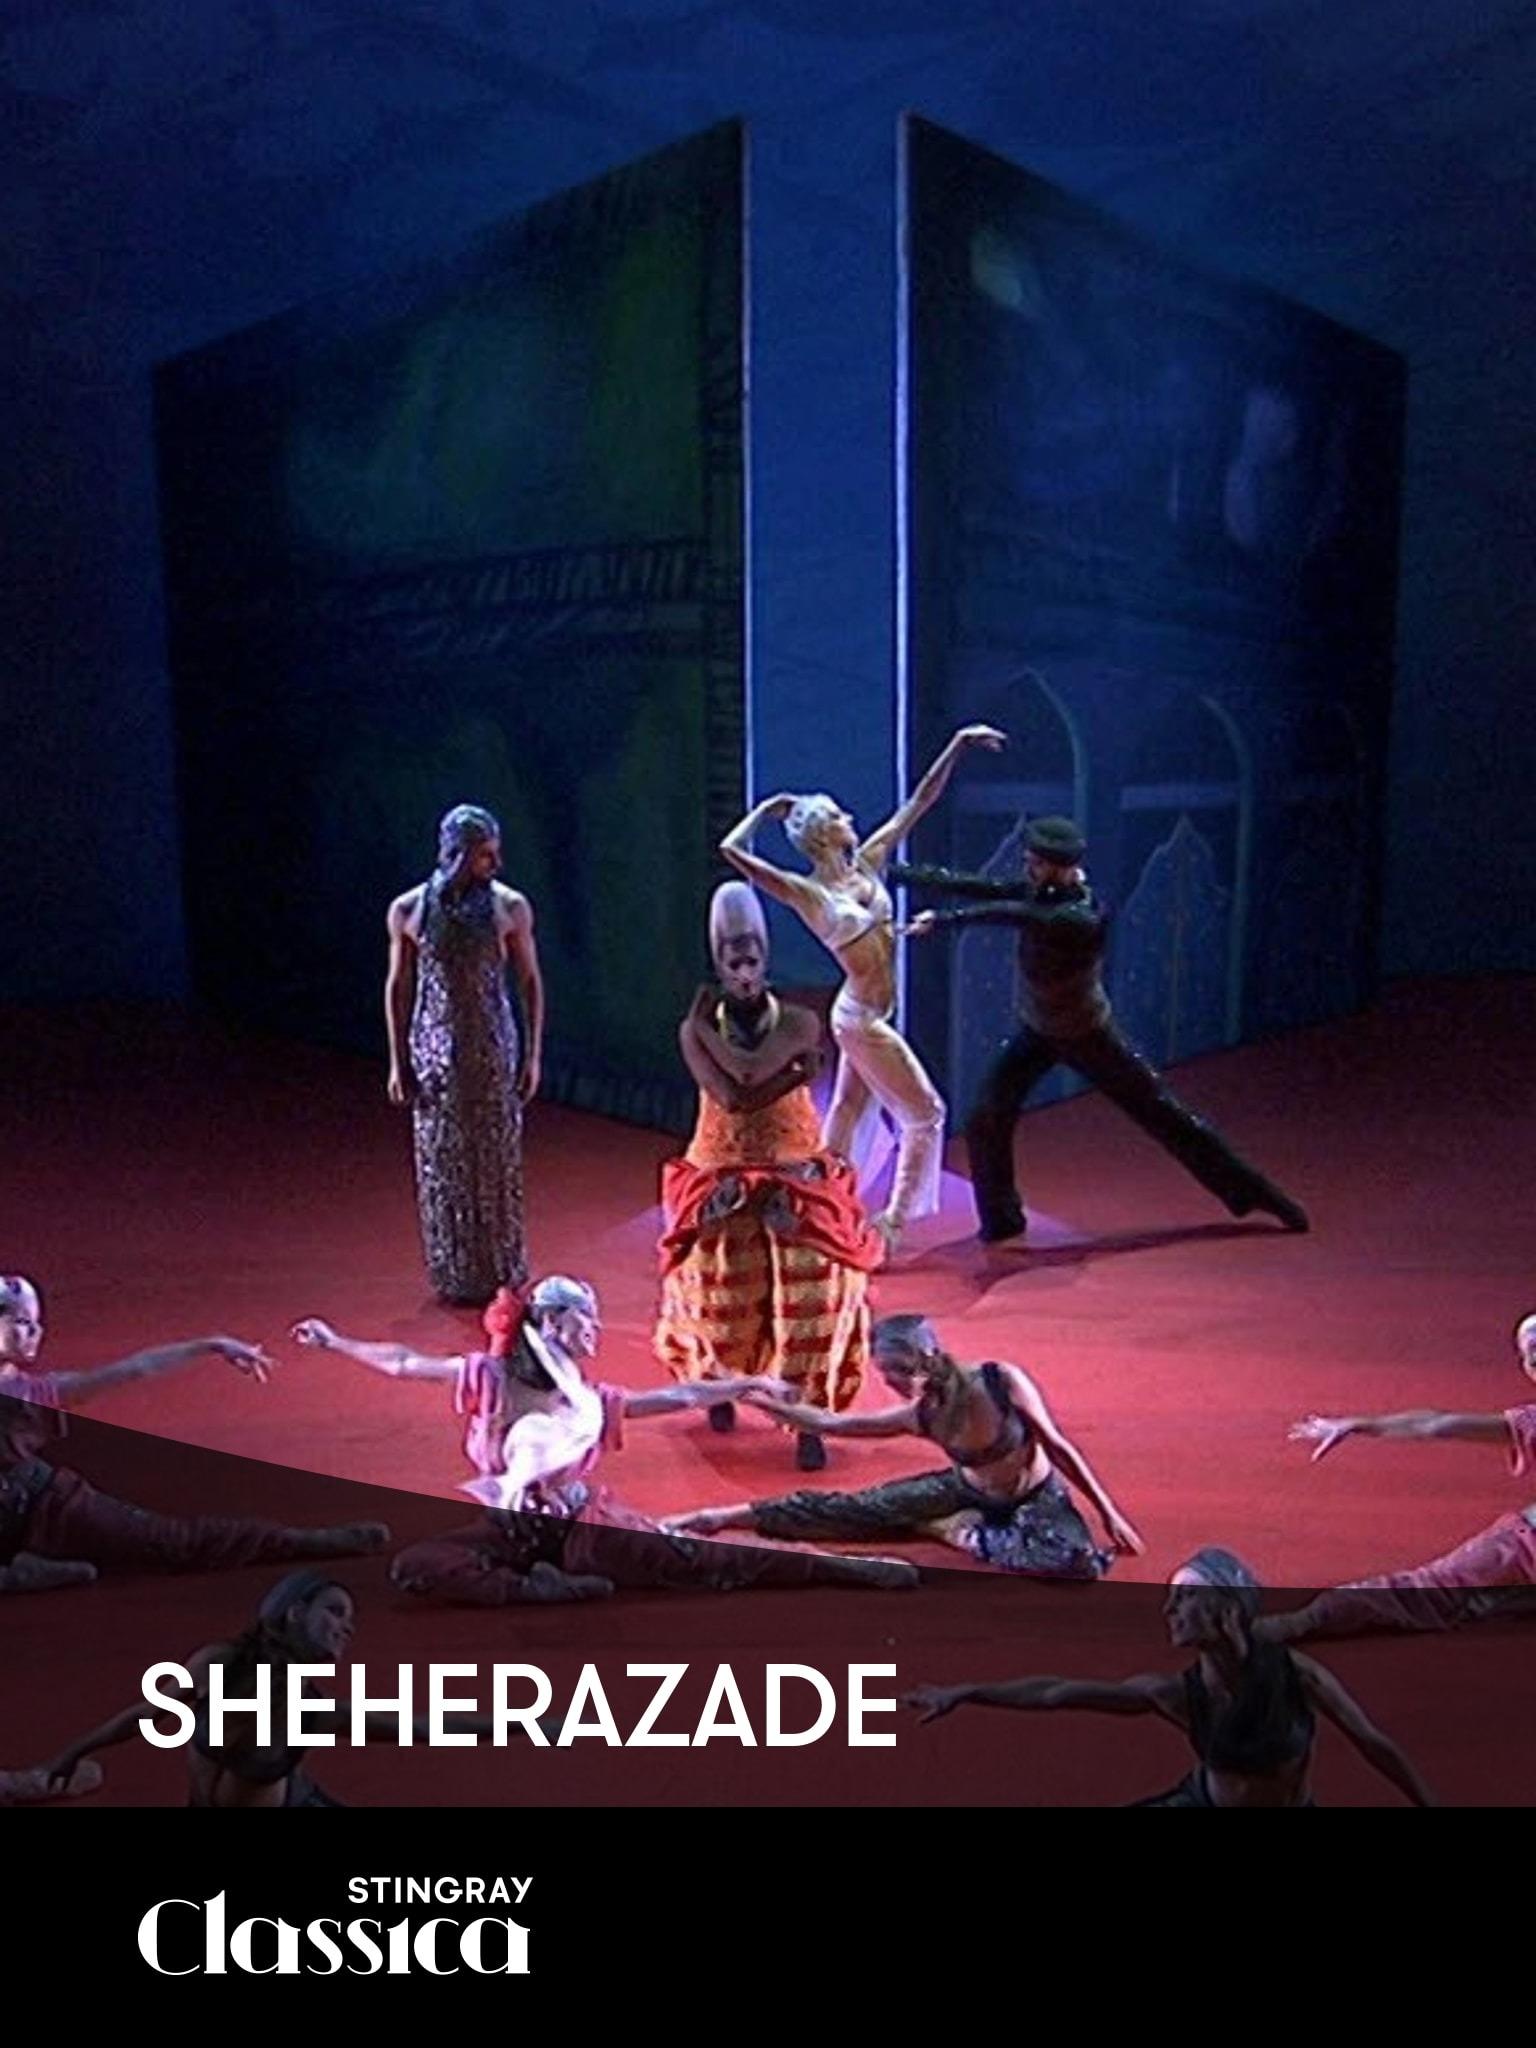 Sheherezade